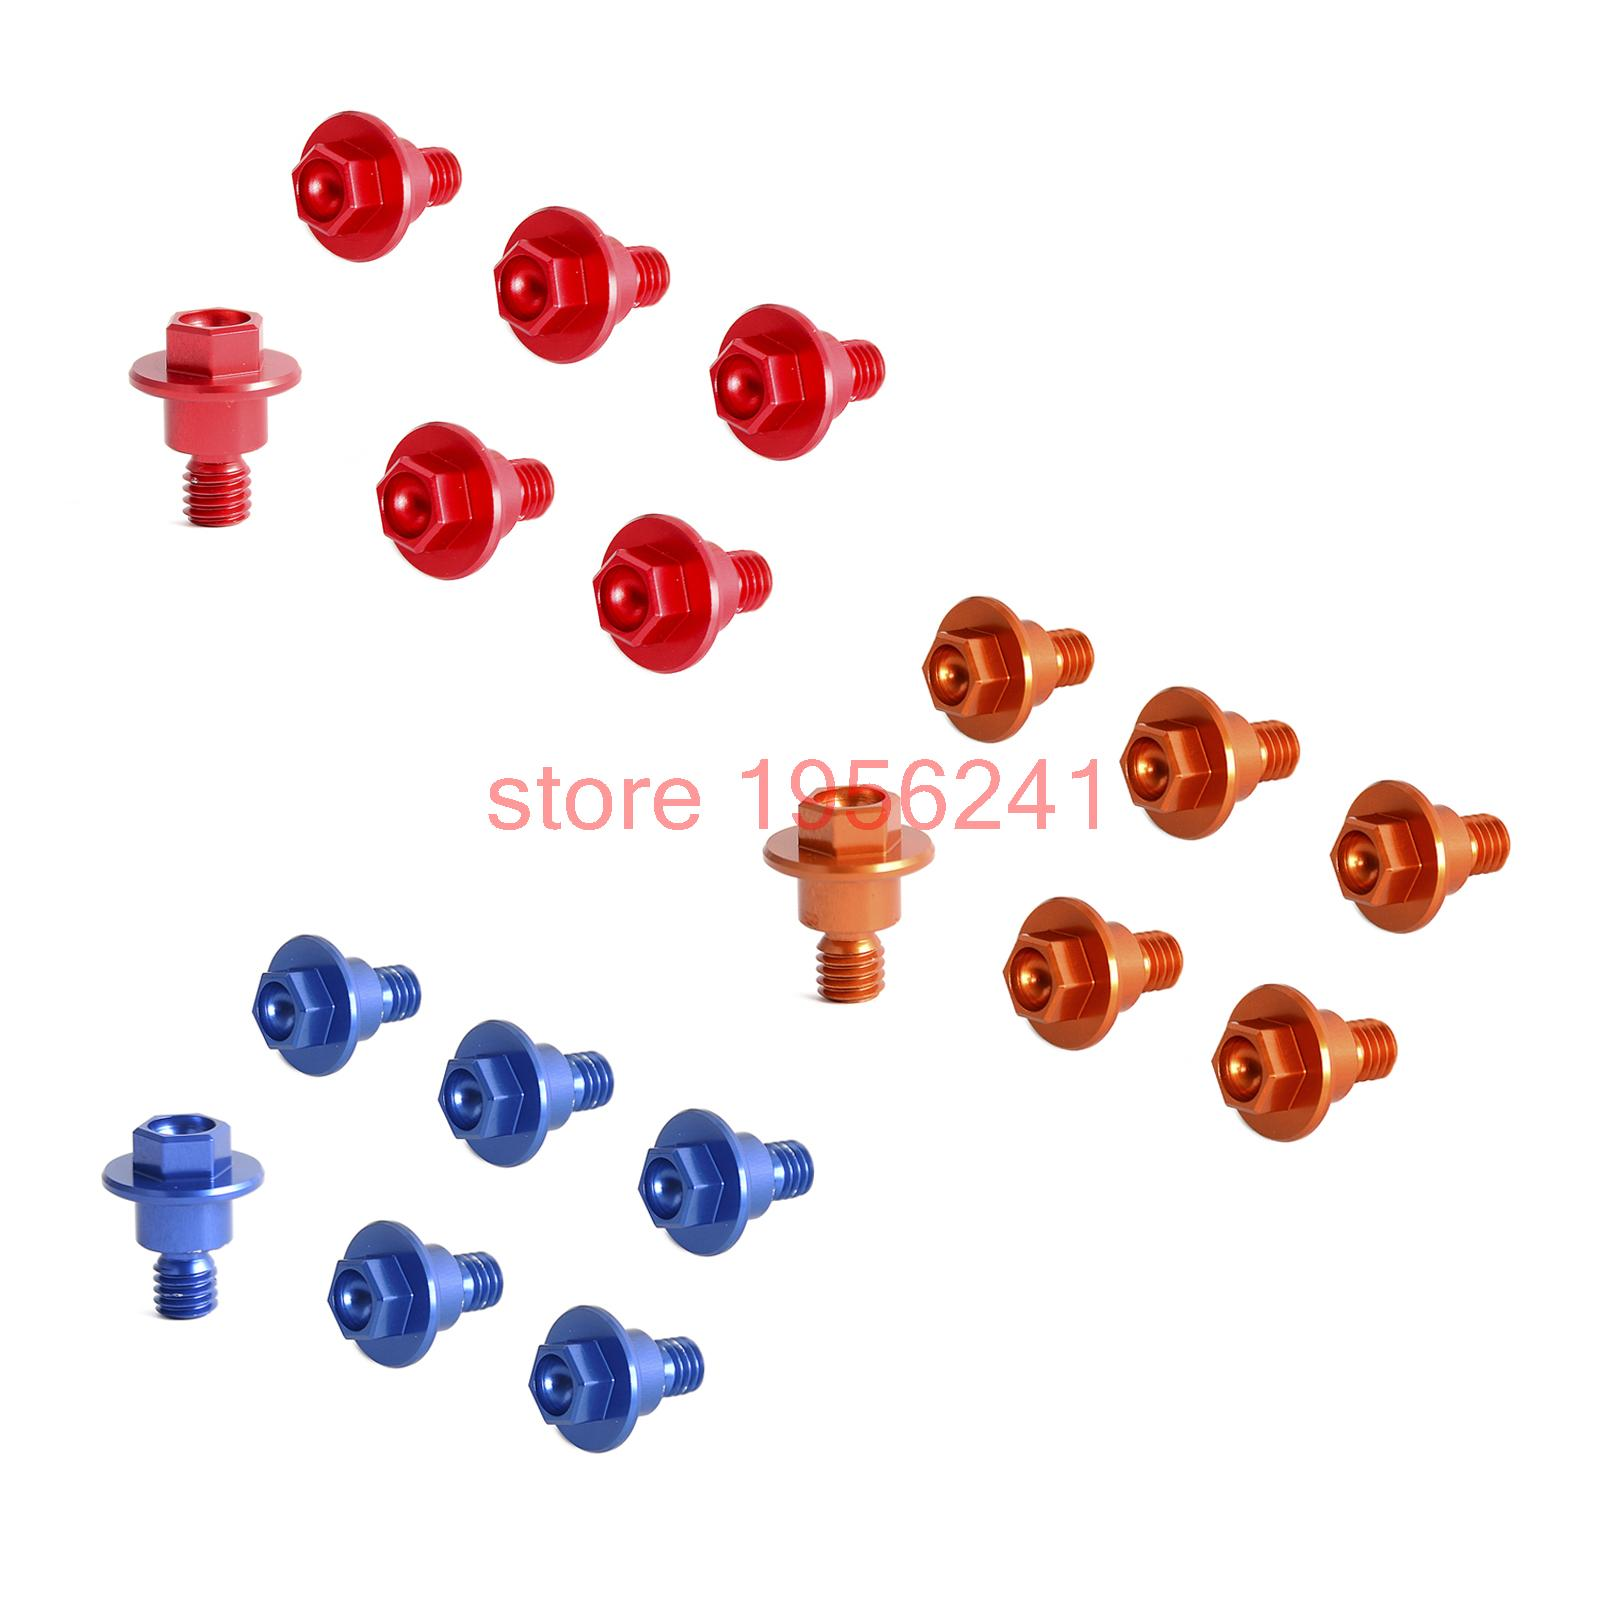 6 Pcs Bolt Fork Guard Set For KTM 65 85 SX 03-15 125 200 250 300 350 400 450 525 530 SX SXF XC XCF EXC EXCF XCW XCFW 2000-2016 for ktm exc sx sxf xc xcw xcf excf excw xcfw mx six days 65 85 125 200 250 300 350 400 450 525 billet mx foot pegs rests pedals